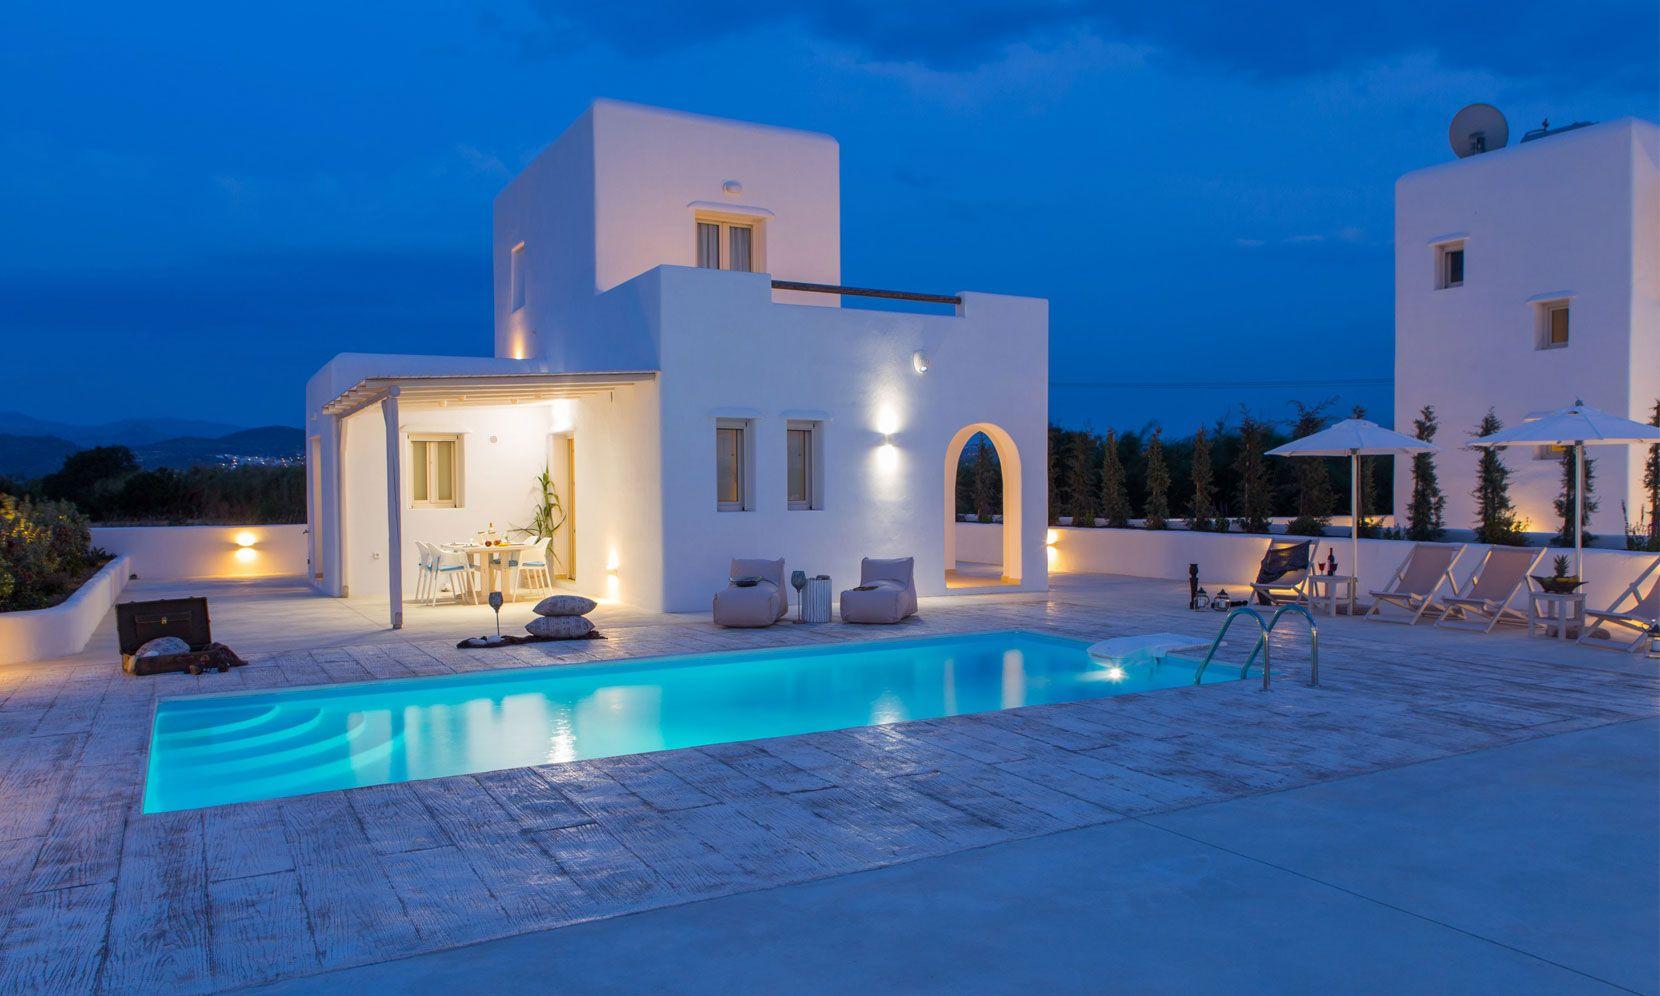 Naxos Villa Topaz jumbotron image